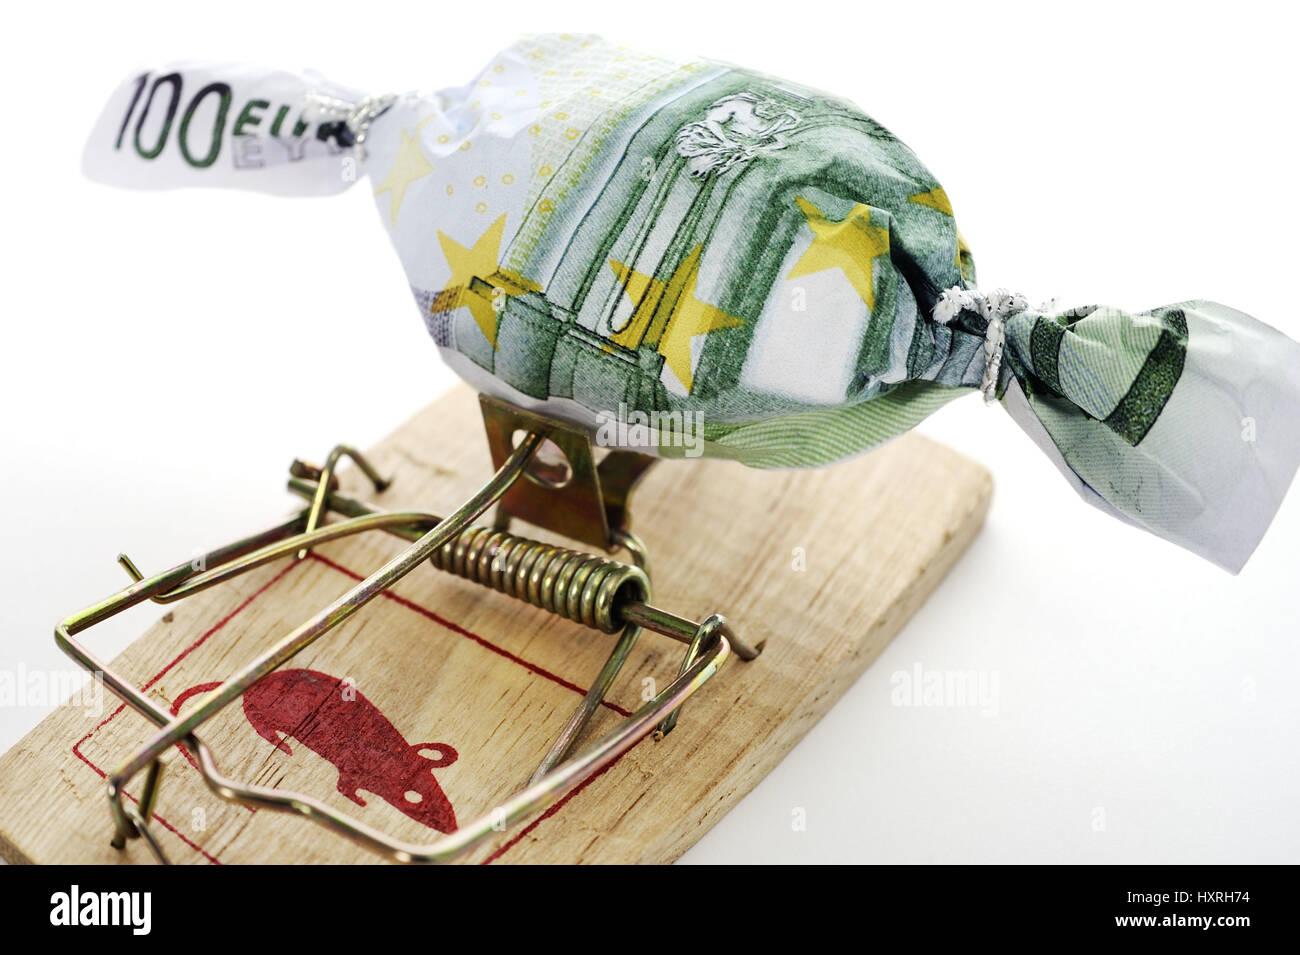 Dulce en Bank note muffledly en ratonera, simbólica foto a deuda, caso en Bonbon Geldschein eingewickelt auf Mausefalle, Symbolfoto Schuldenfalle Foto de stock